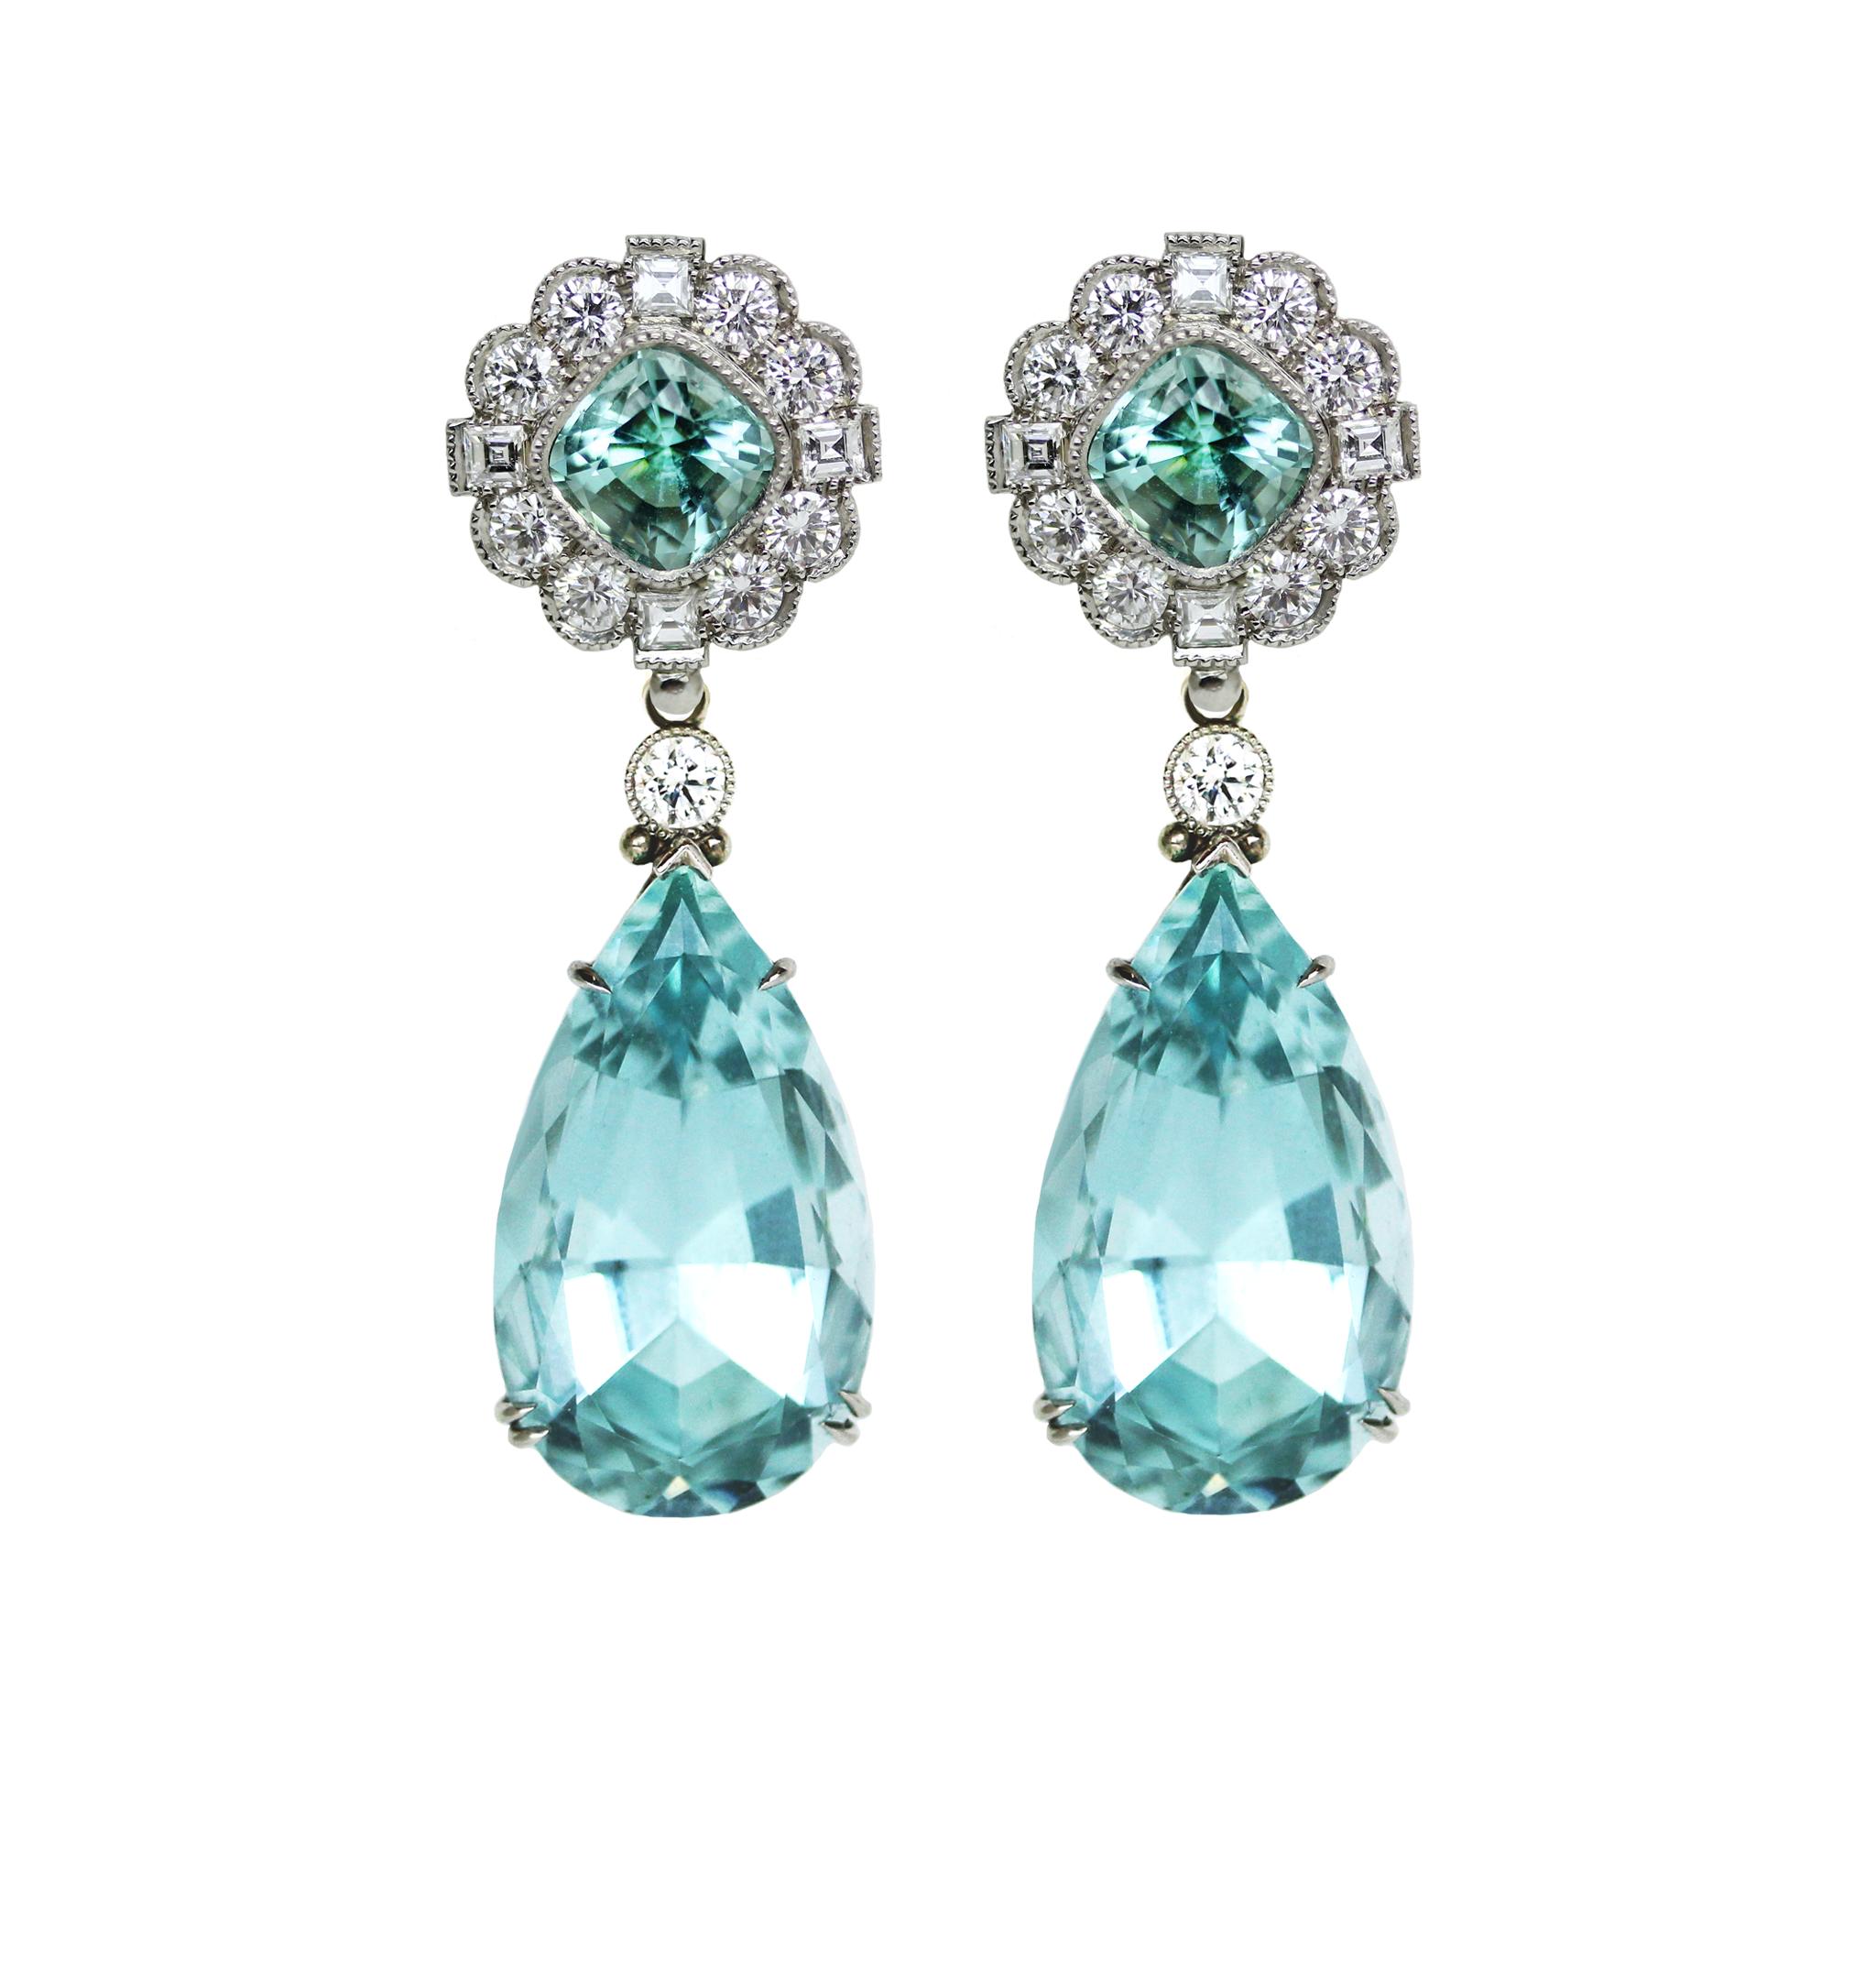 Tourmaline Amp Aquamarine Earrings Featherstone Design